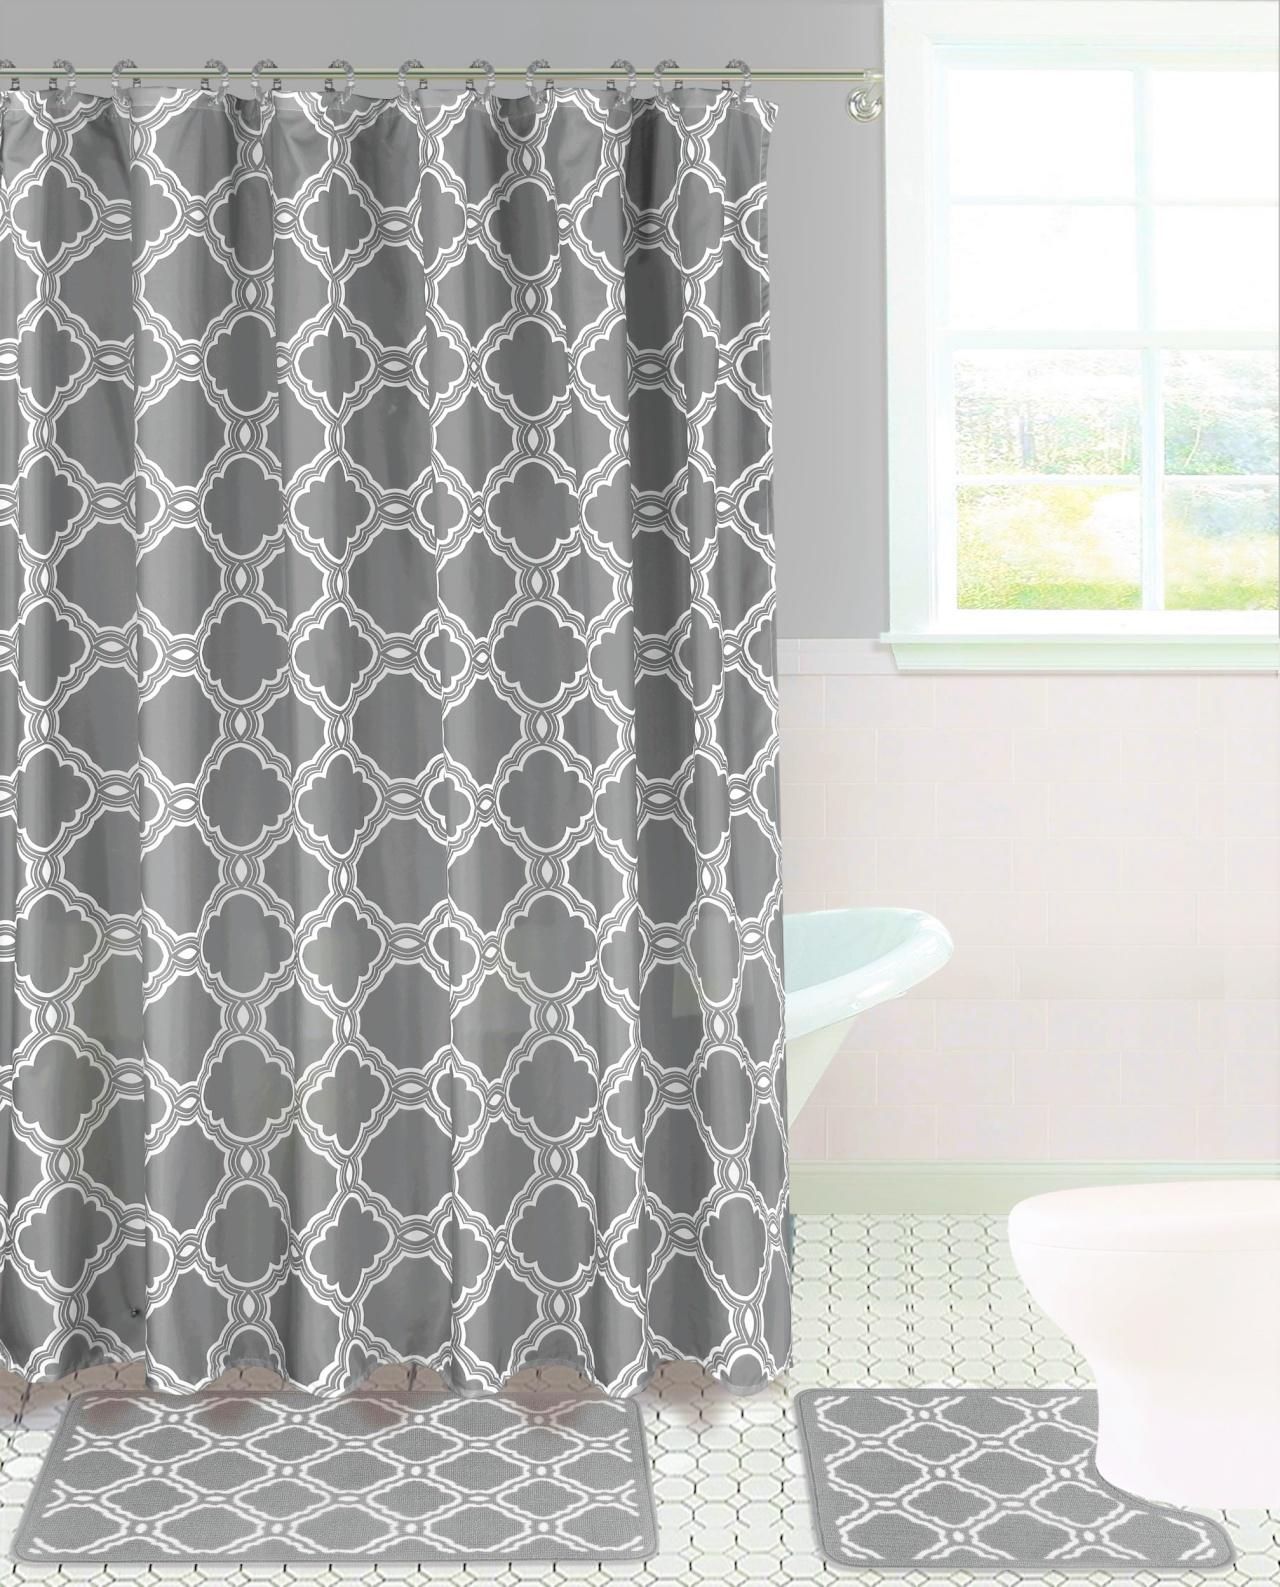 15 piece hotel bathroom sets 2 non slip bath mats rugs fabric shower curtain 12 hooks fresco grey walmart com